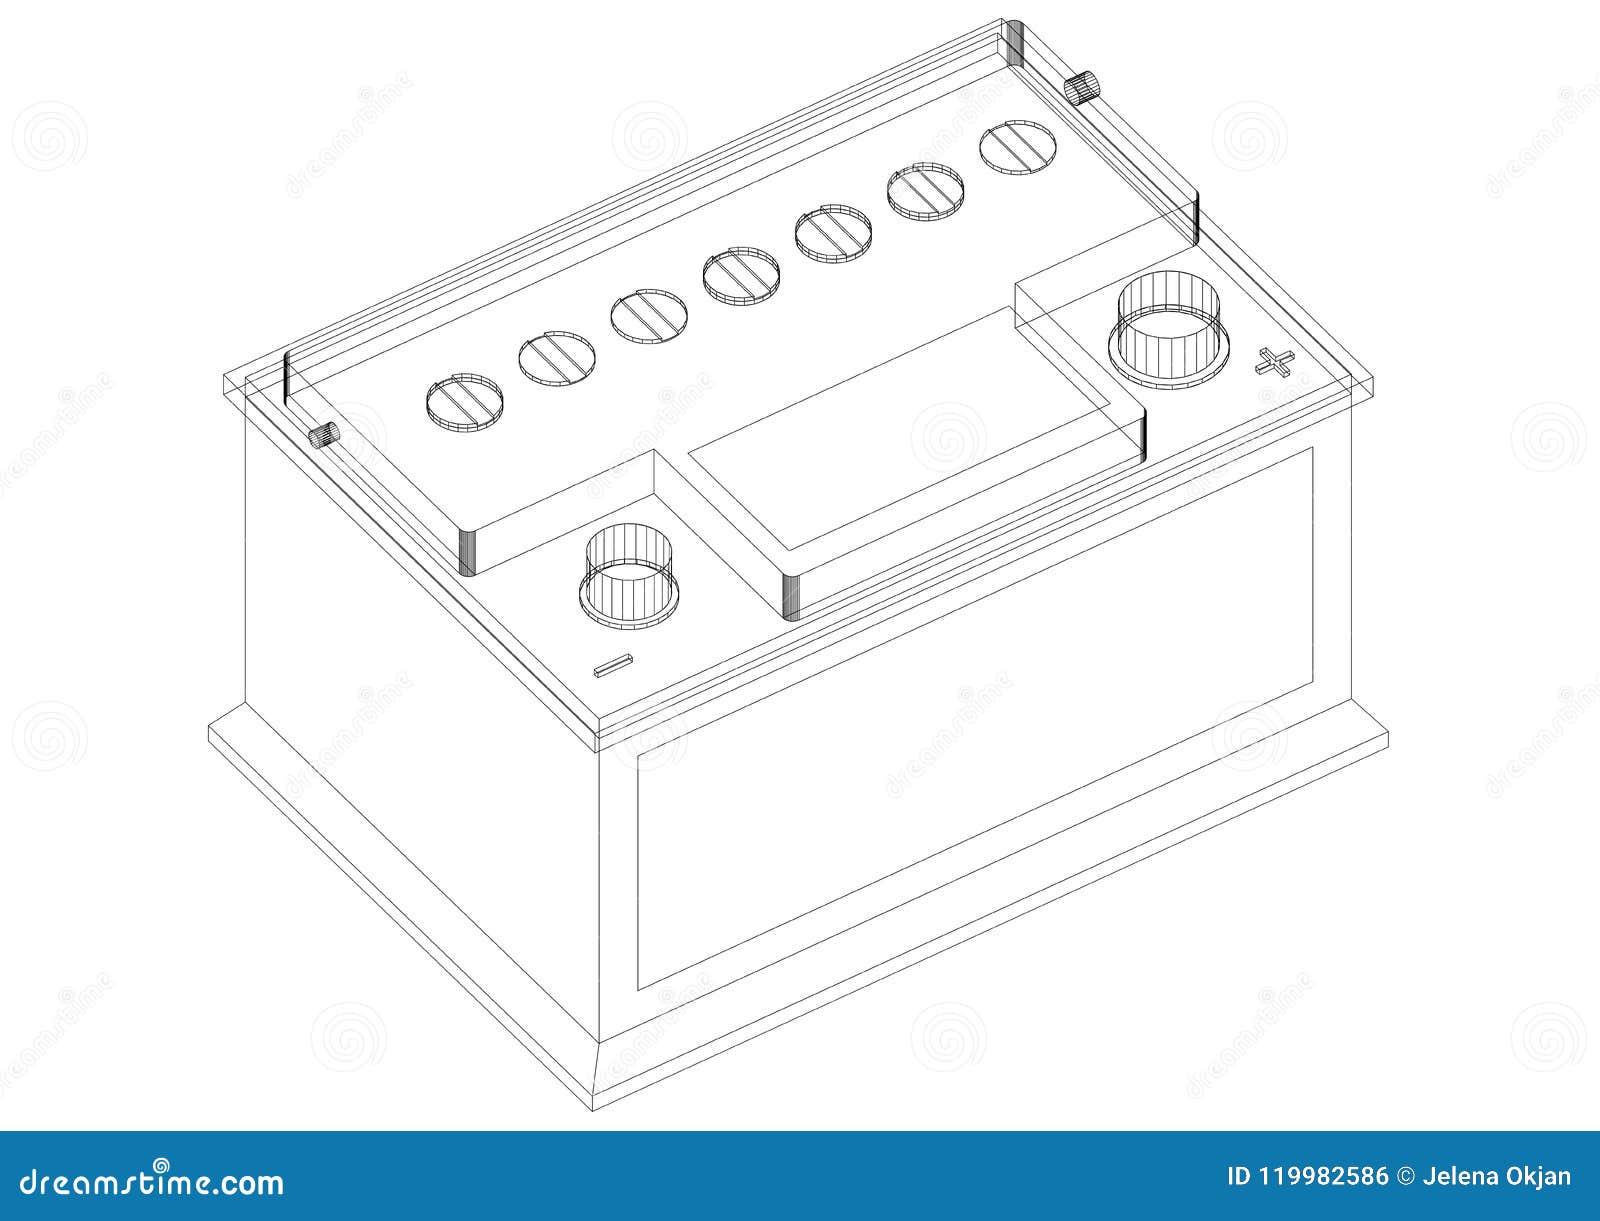 Car Battery Architect Blueprint Isolated Stock Illustration